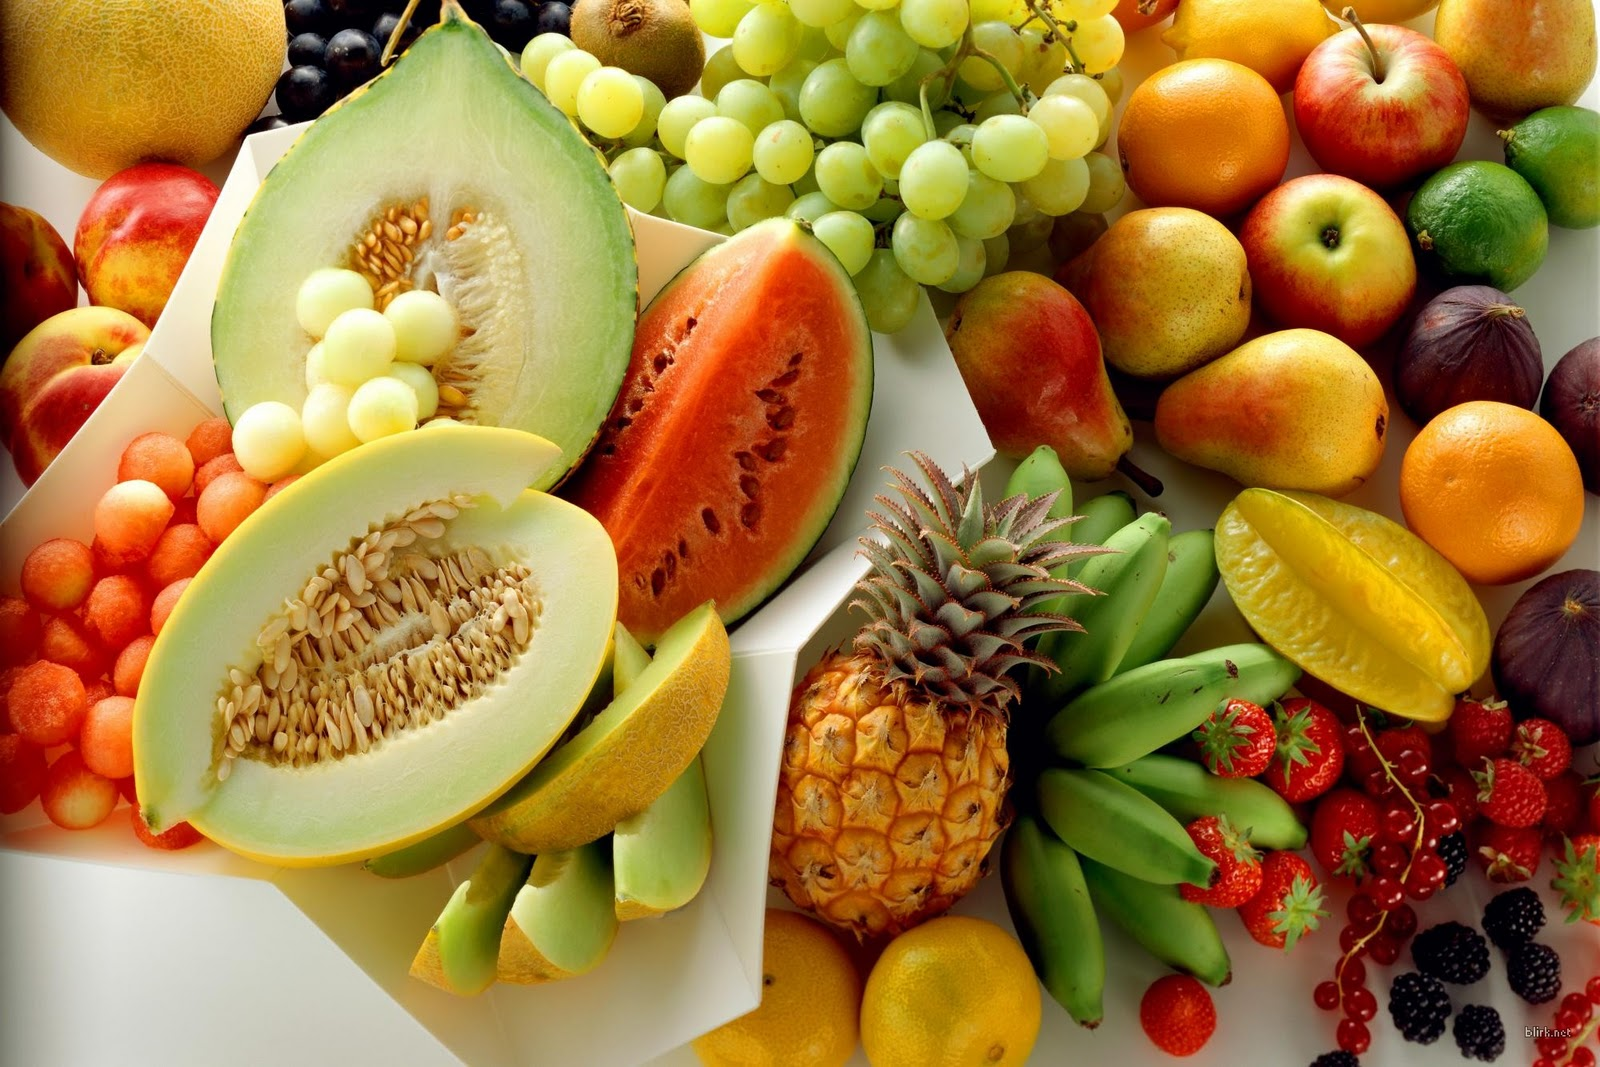 http://3.bp.blogspot.com/_kRnqu-w9J50/TSLE5KqHxHI/AAAAAAAAABQ/EPb0ayL7a0U/s1600/fruit-001.jpg